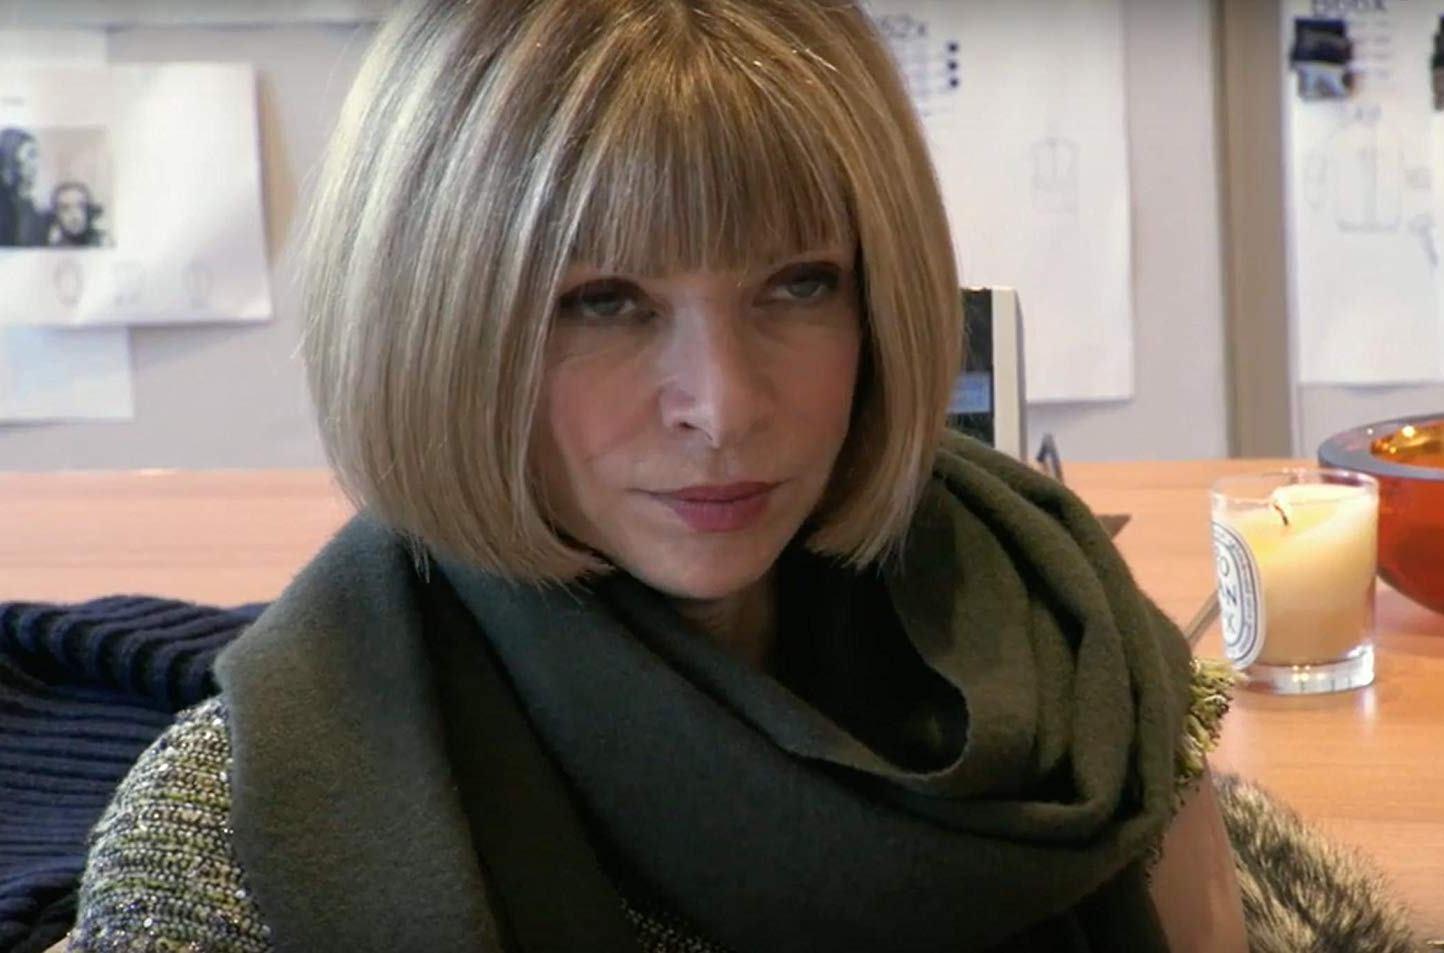 1אנה ווינטור בסרט גיליון ספטמבר